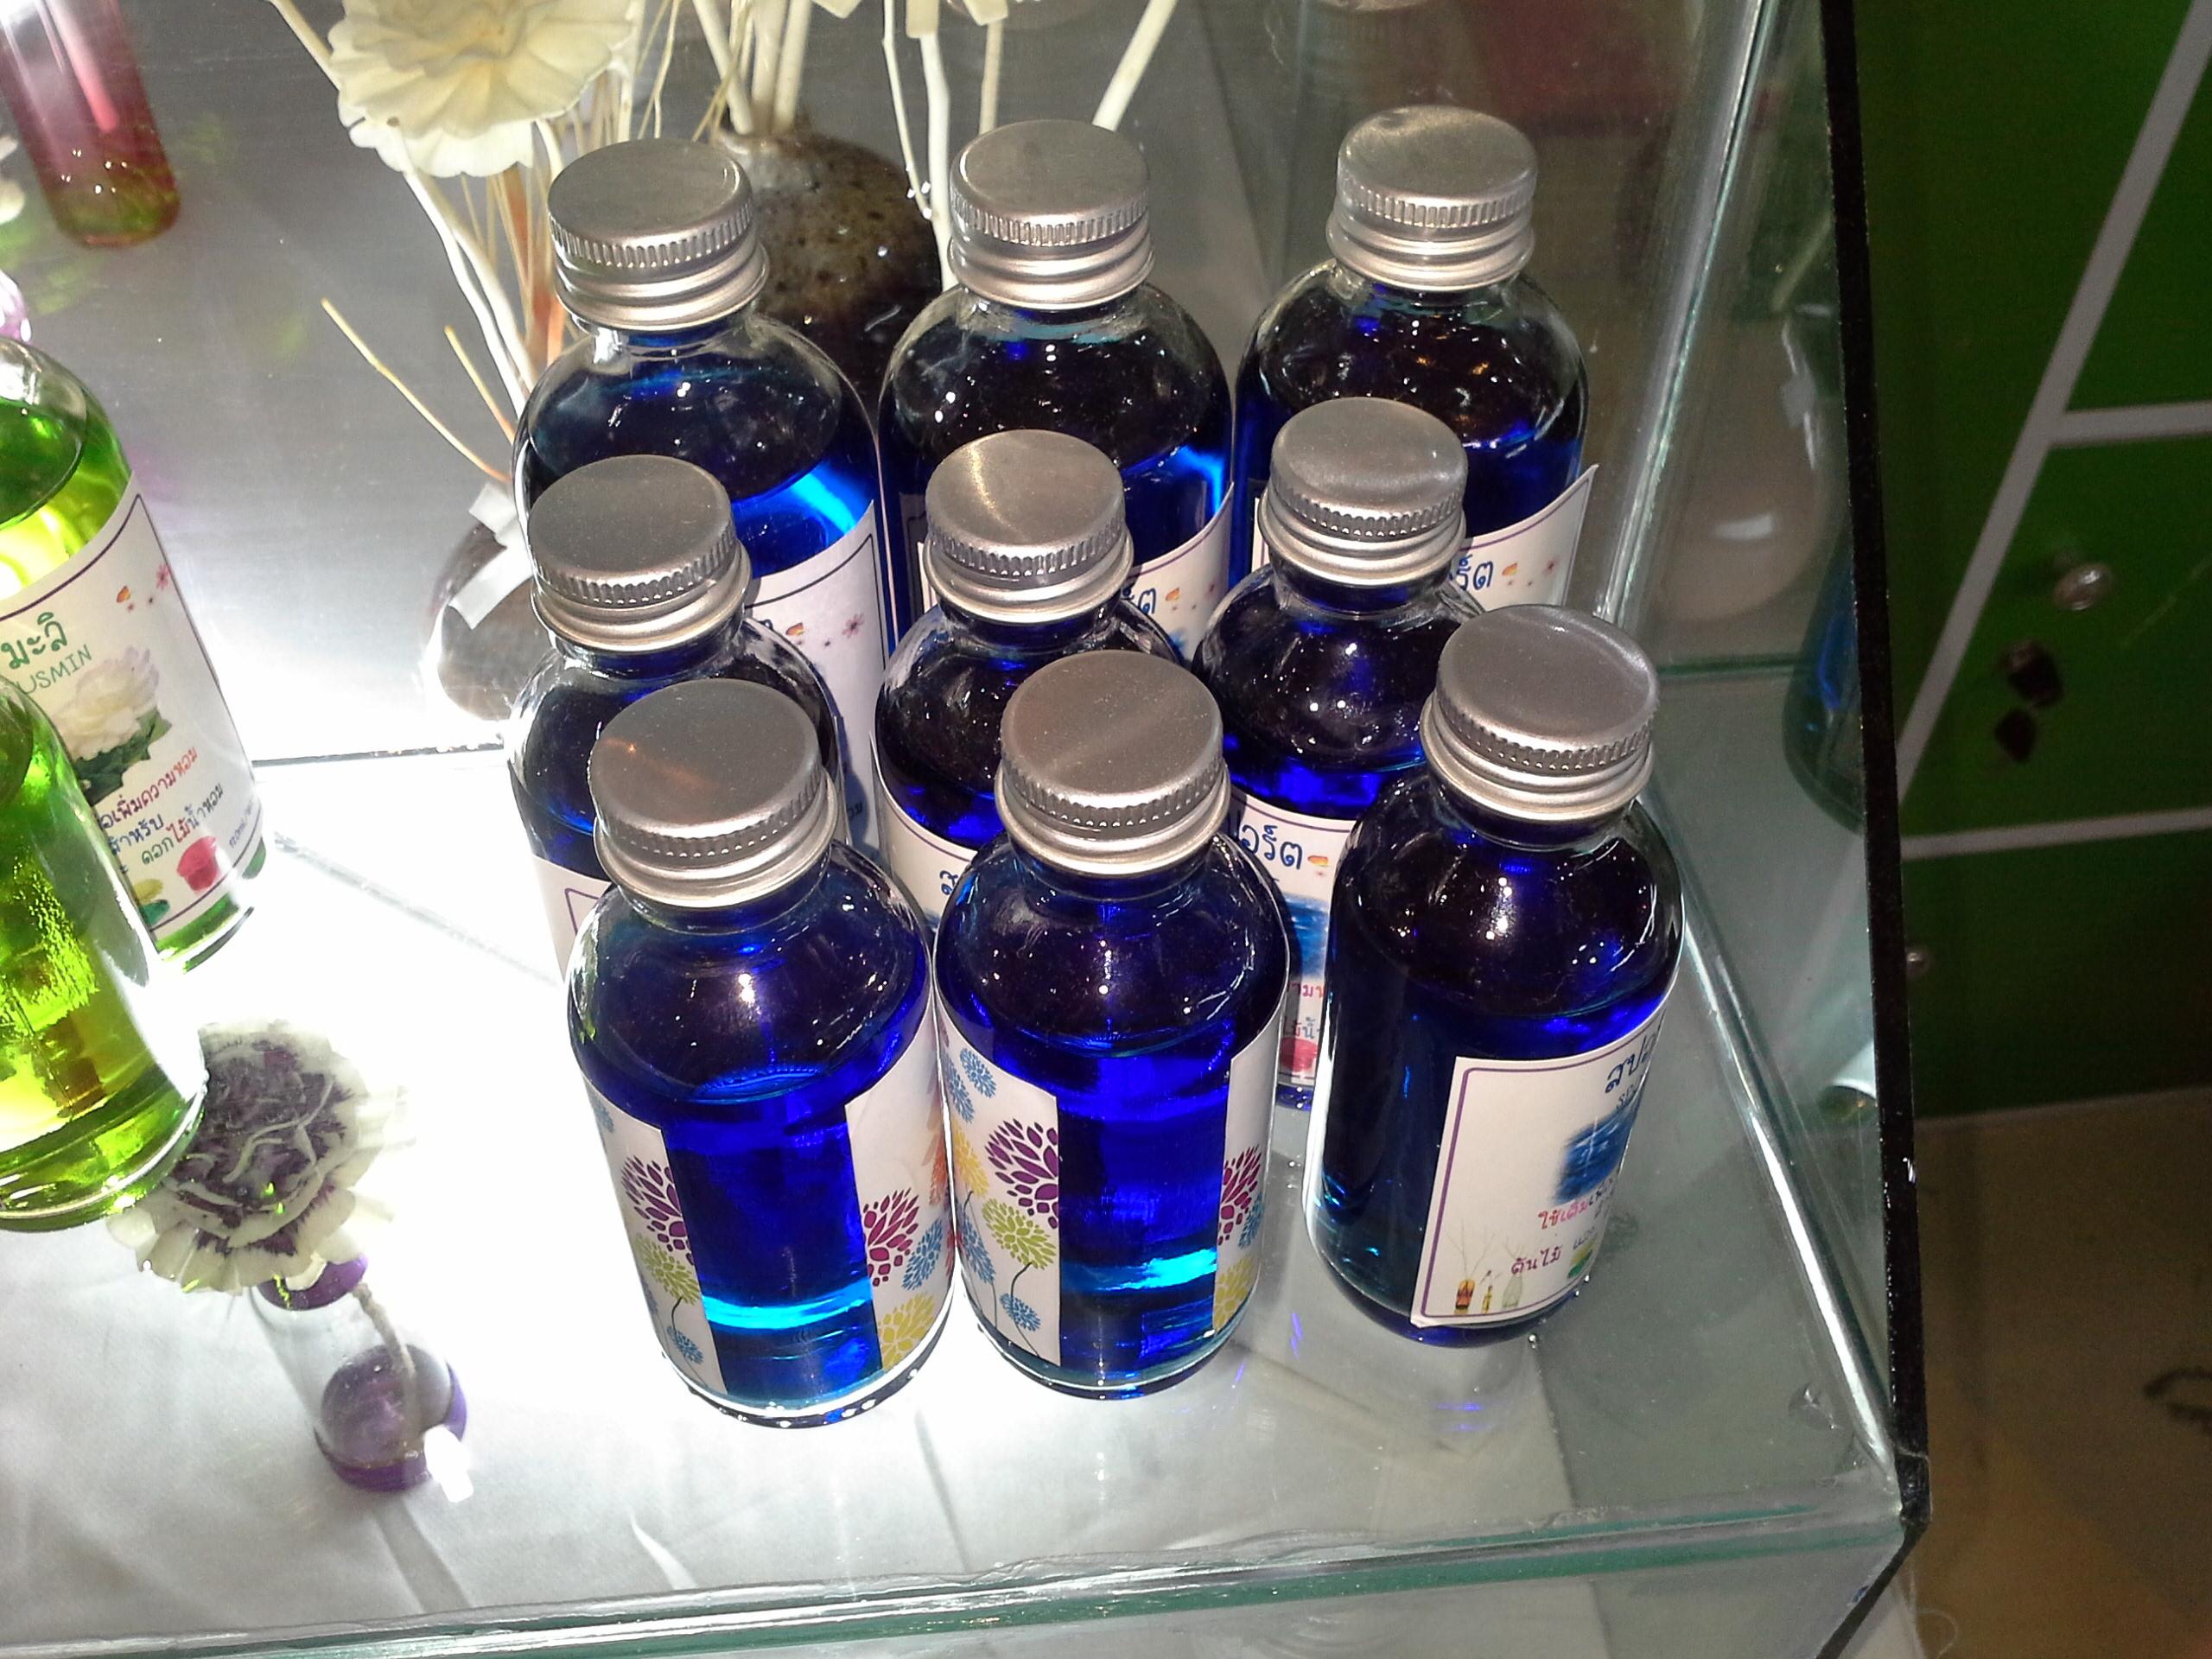 Blue fragrance